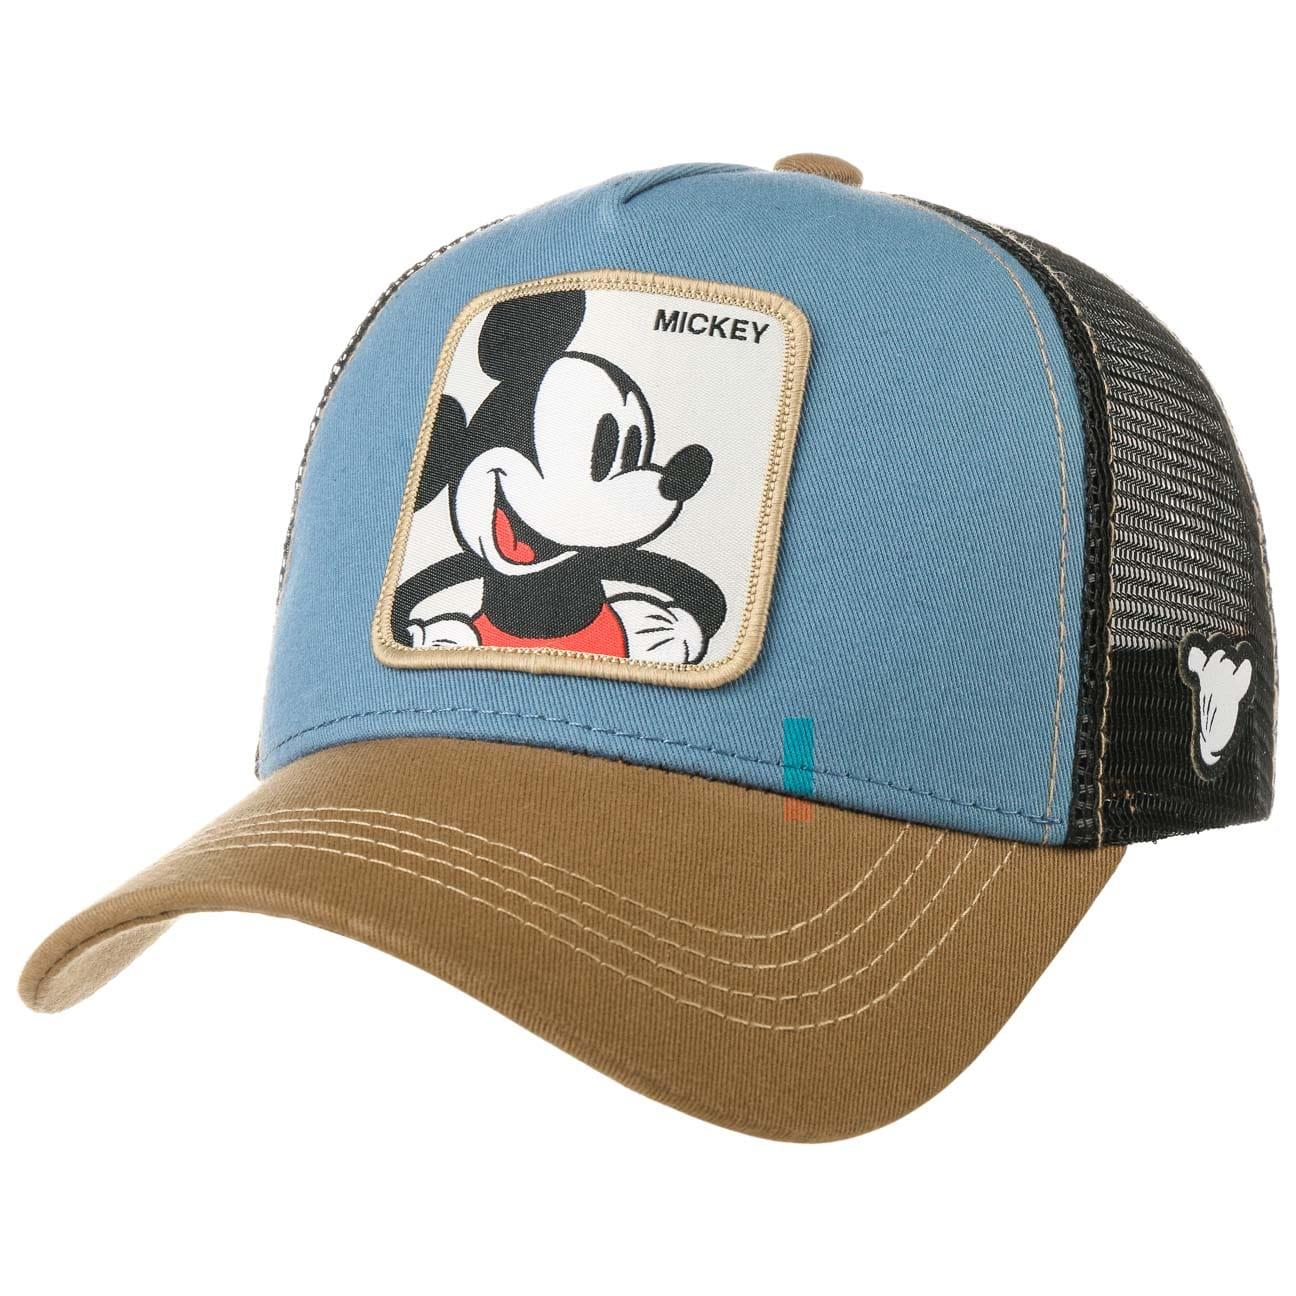 Gorra Trucker Disney Mickey 1 by Capslab